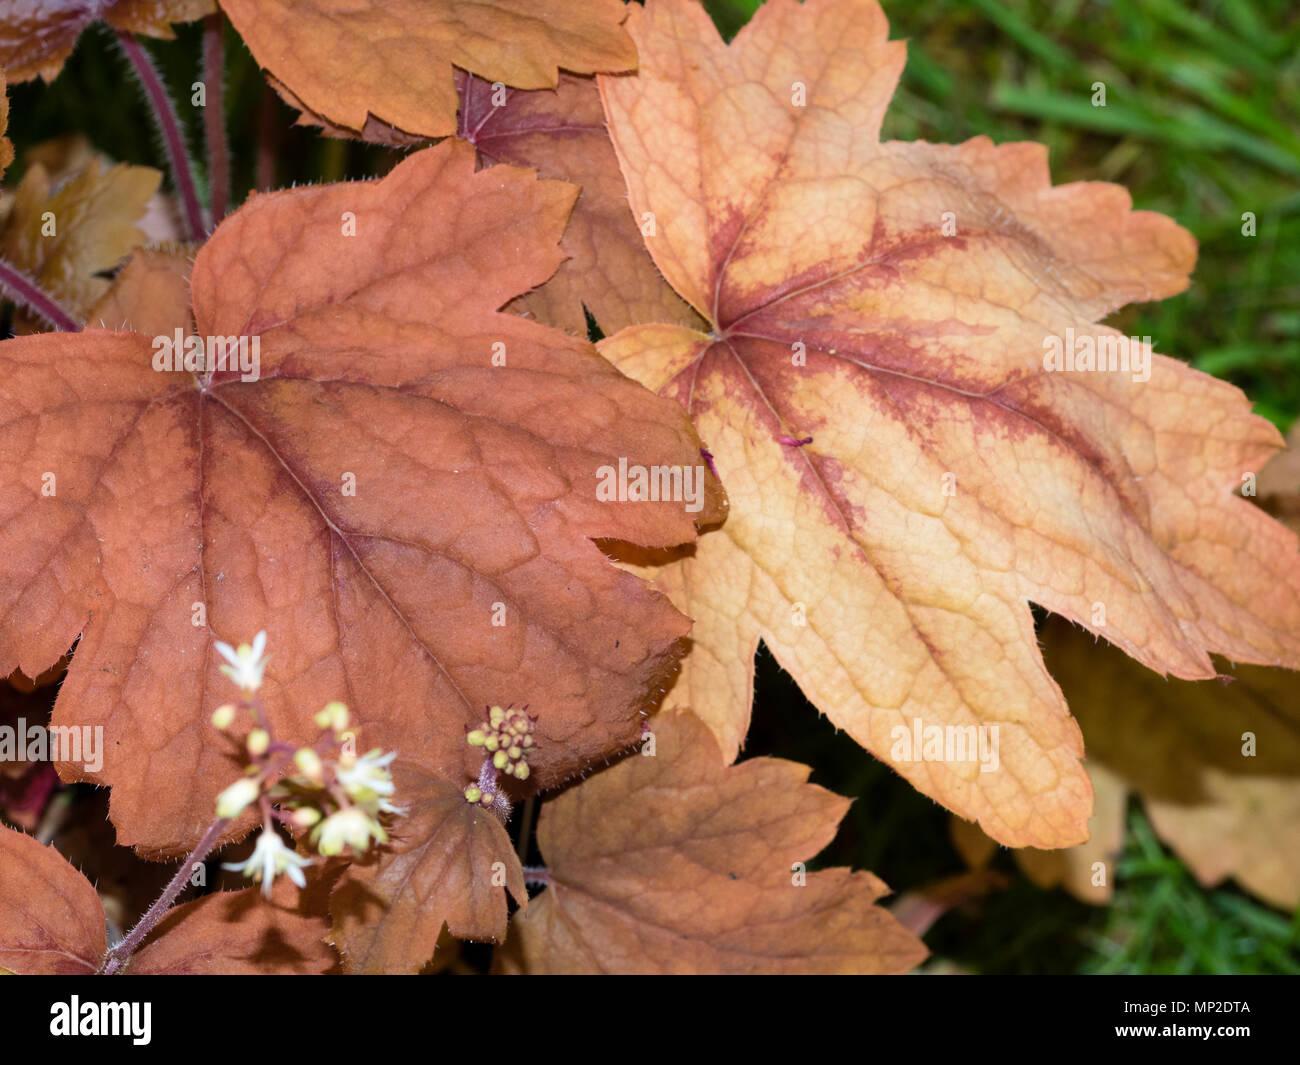 Decorative russet brown foliage of the hardy evergreen perennial, Heuchera 'Sweet Tea' - Stock Image